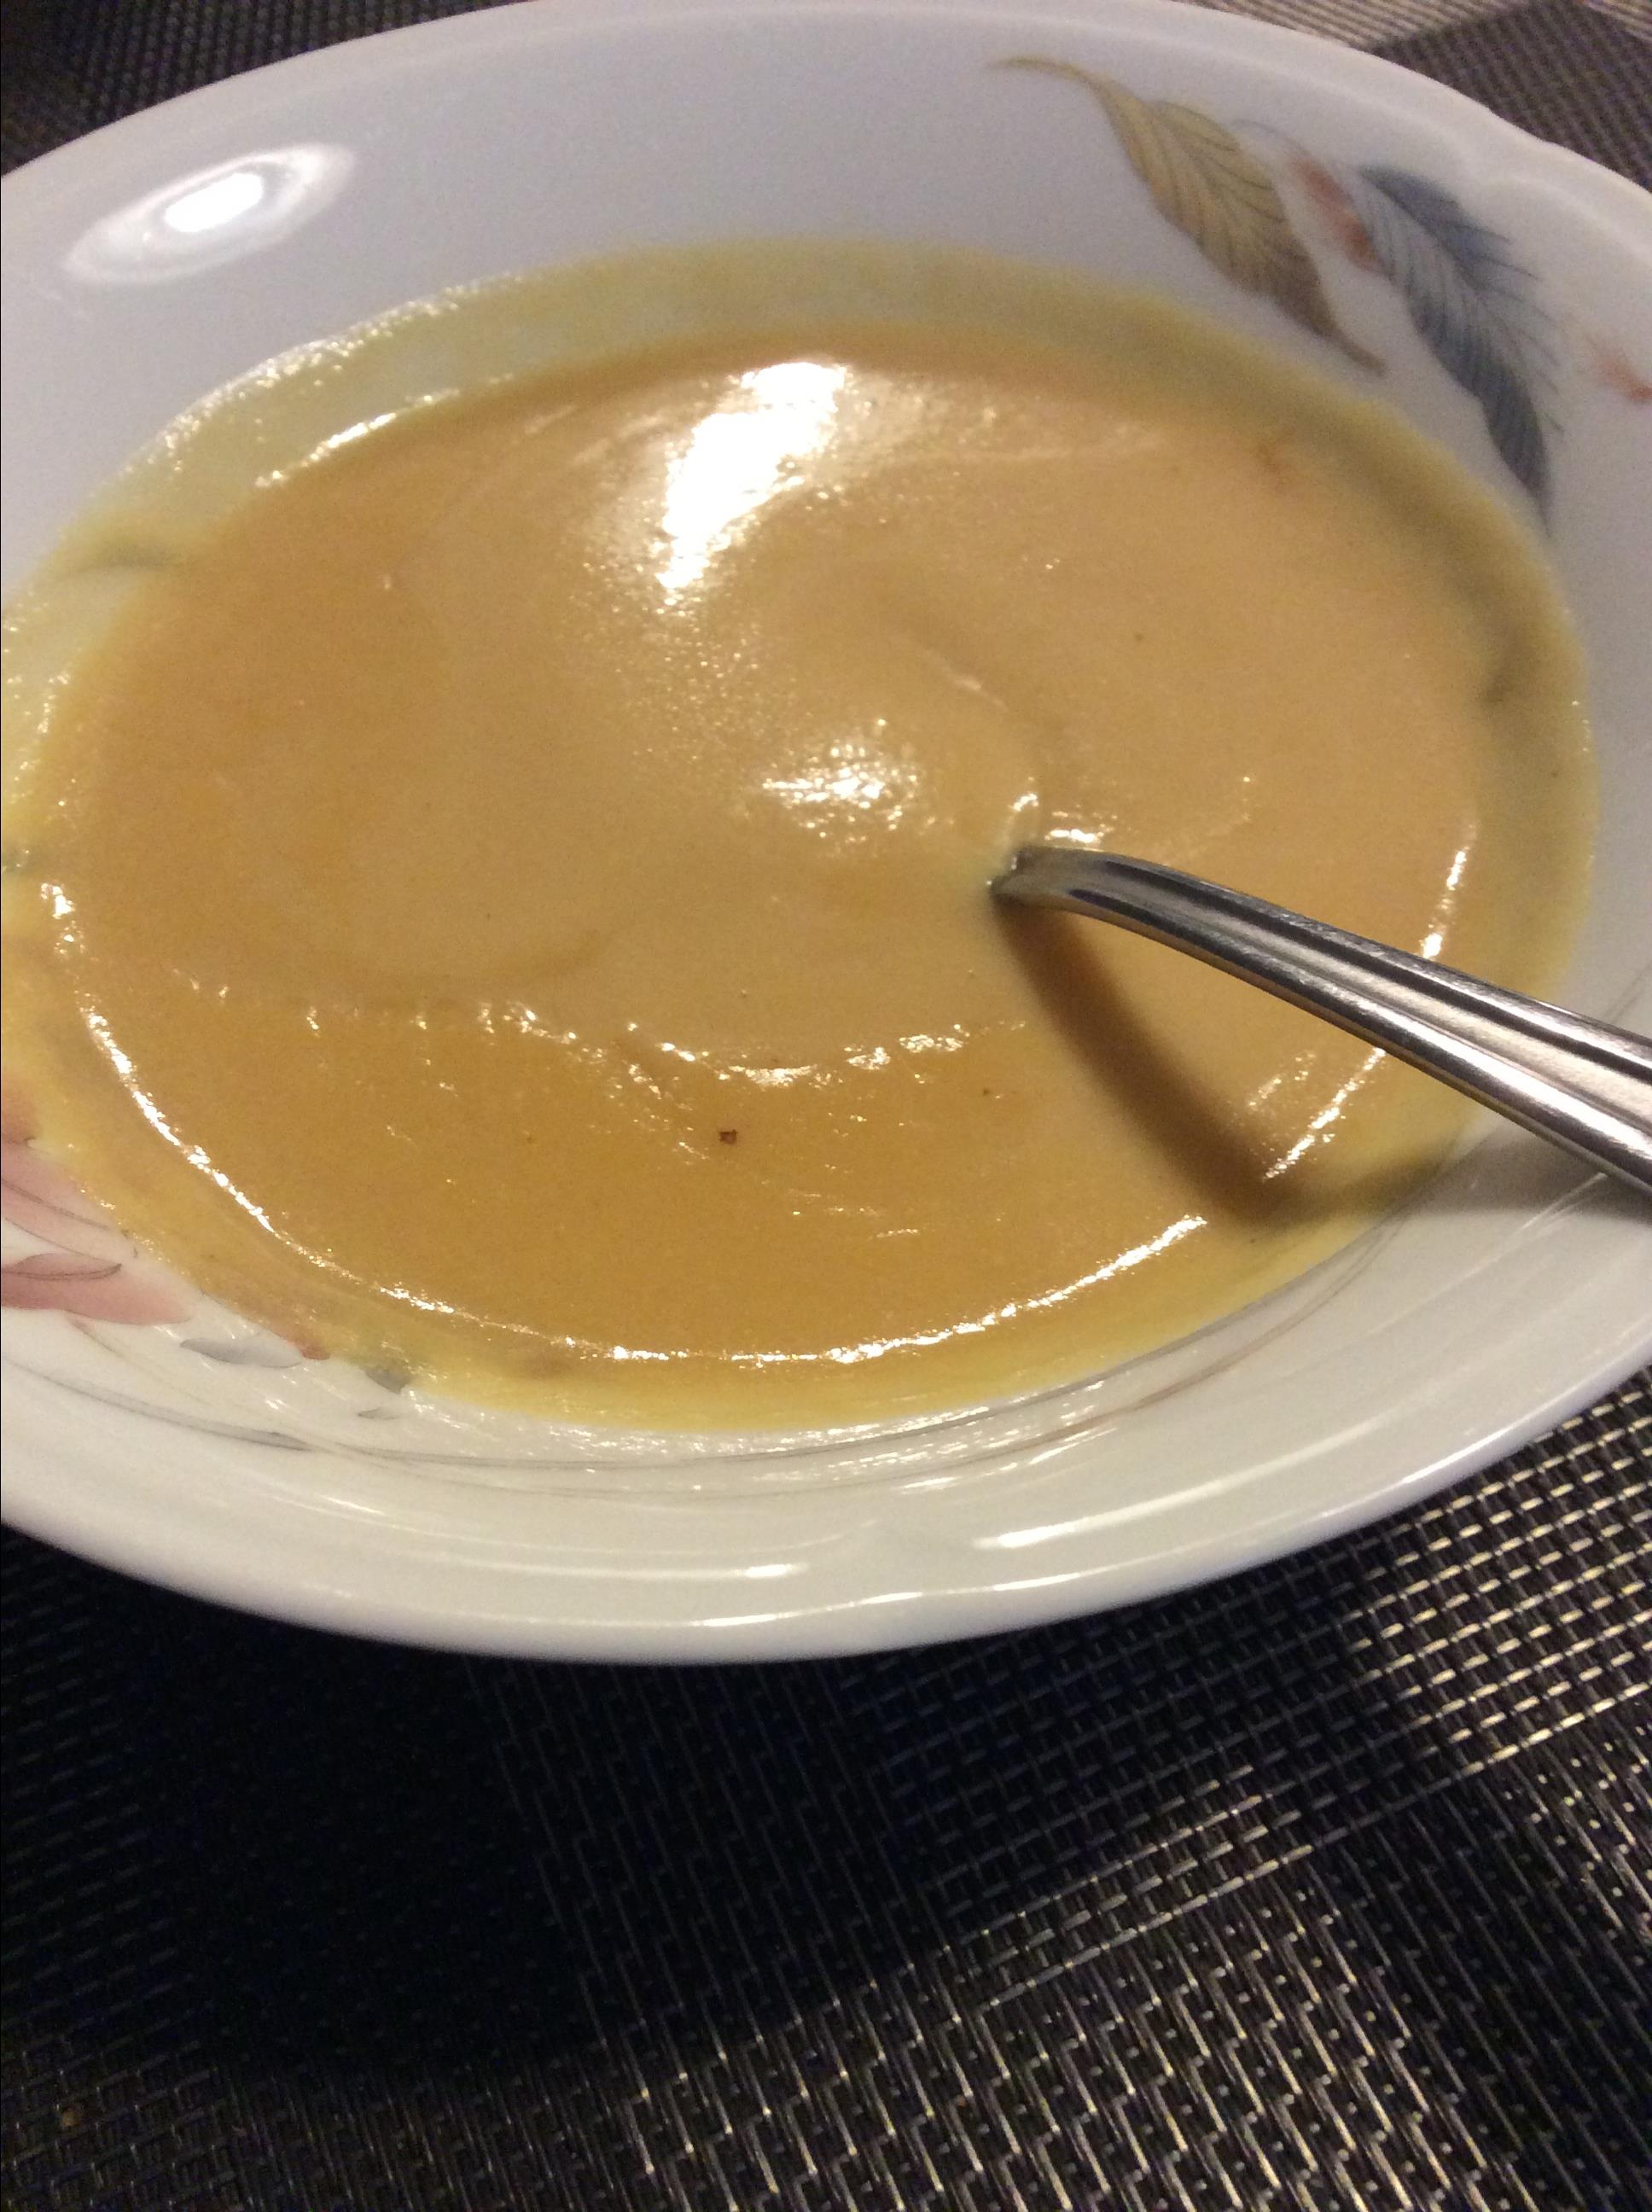 Kelly's Butterscotch Pudding